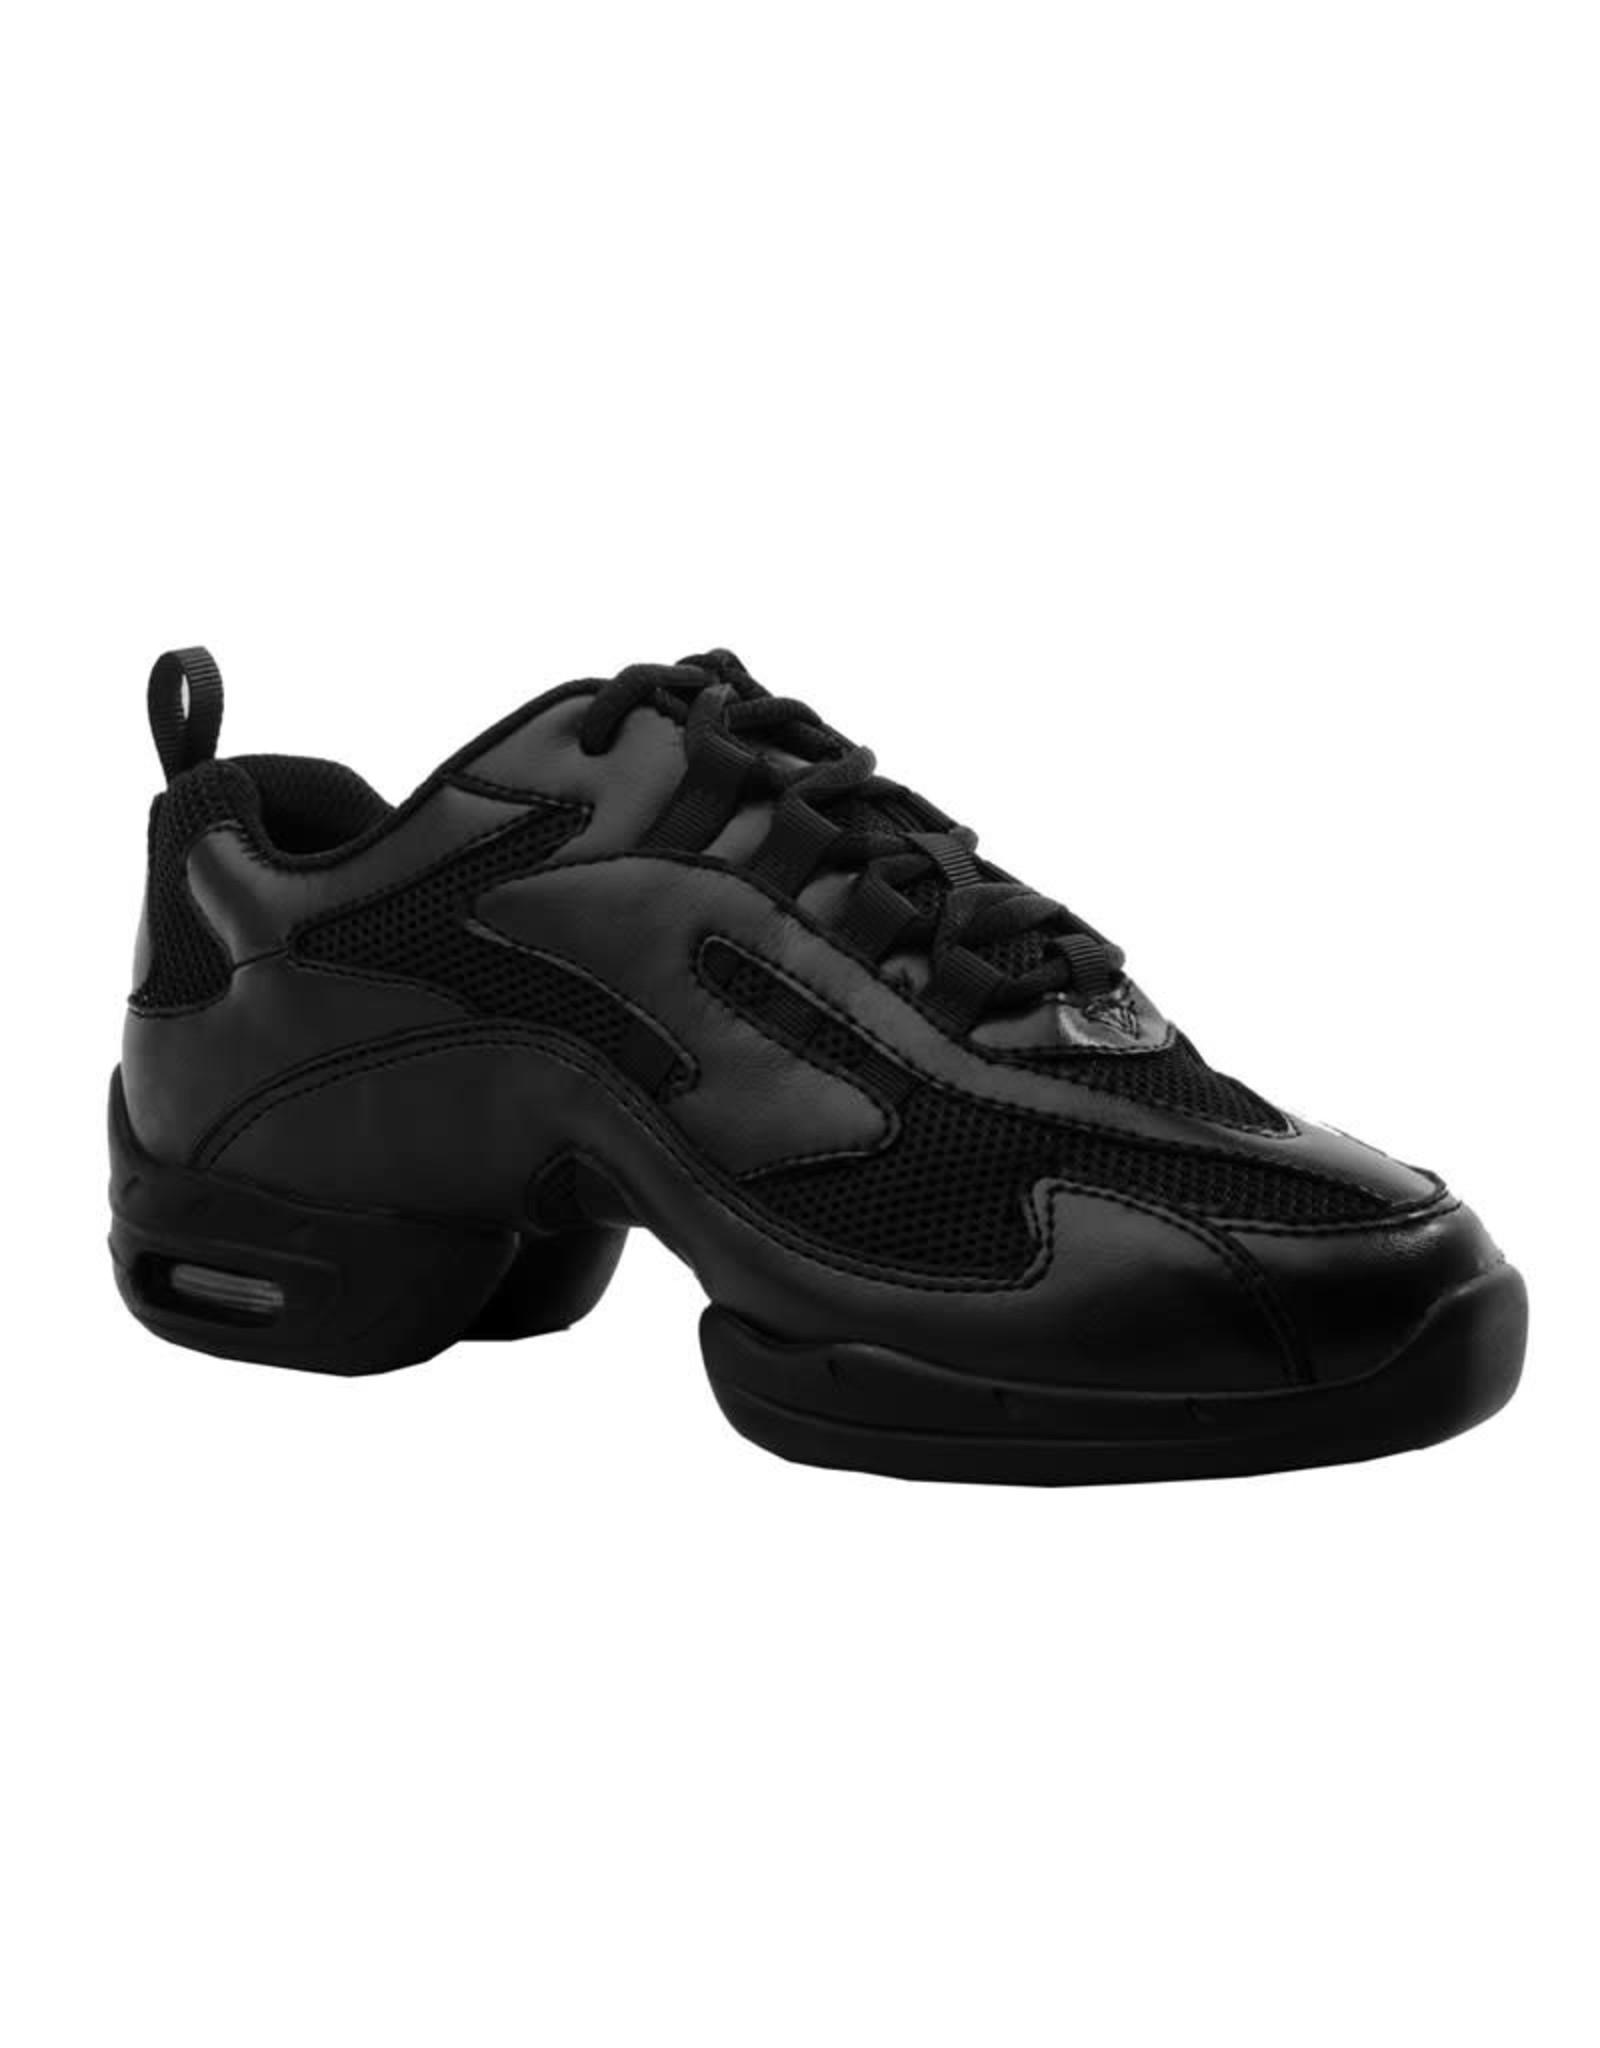 Sansha Sports shoe Zoom P04